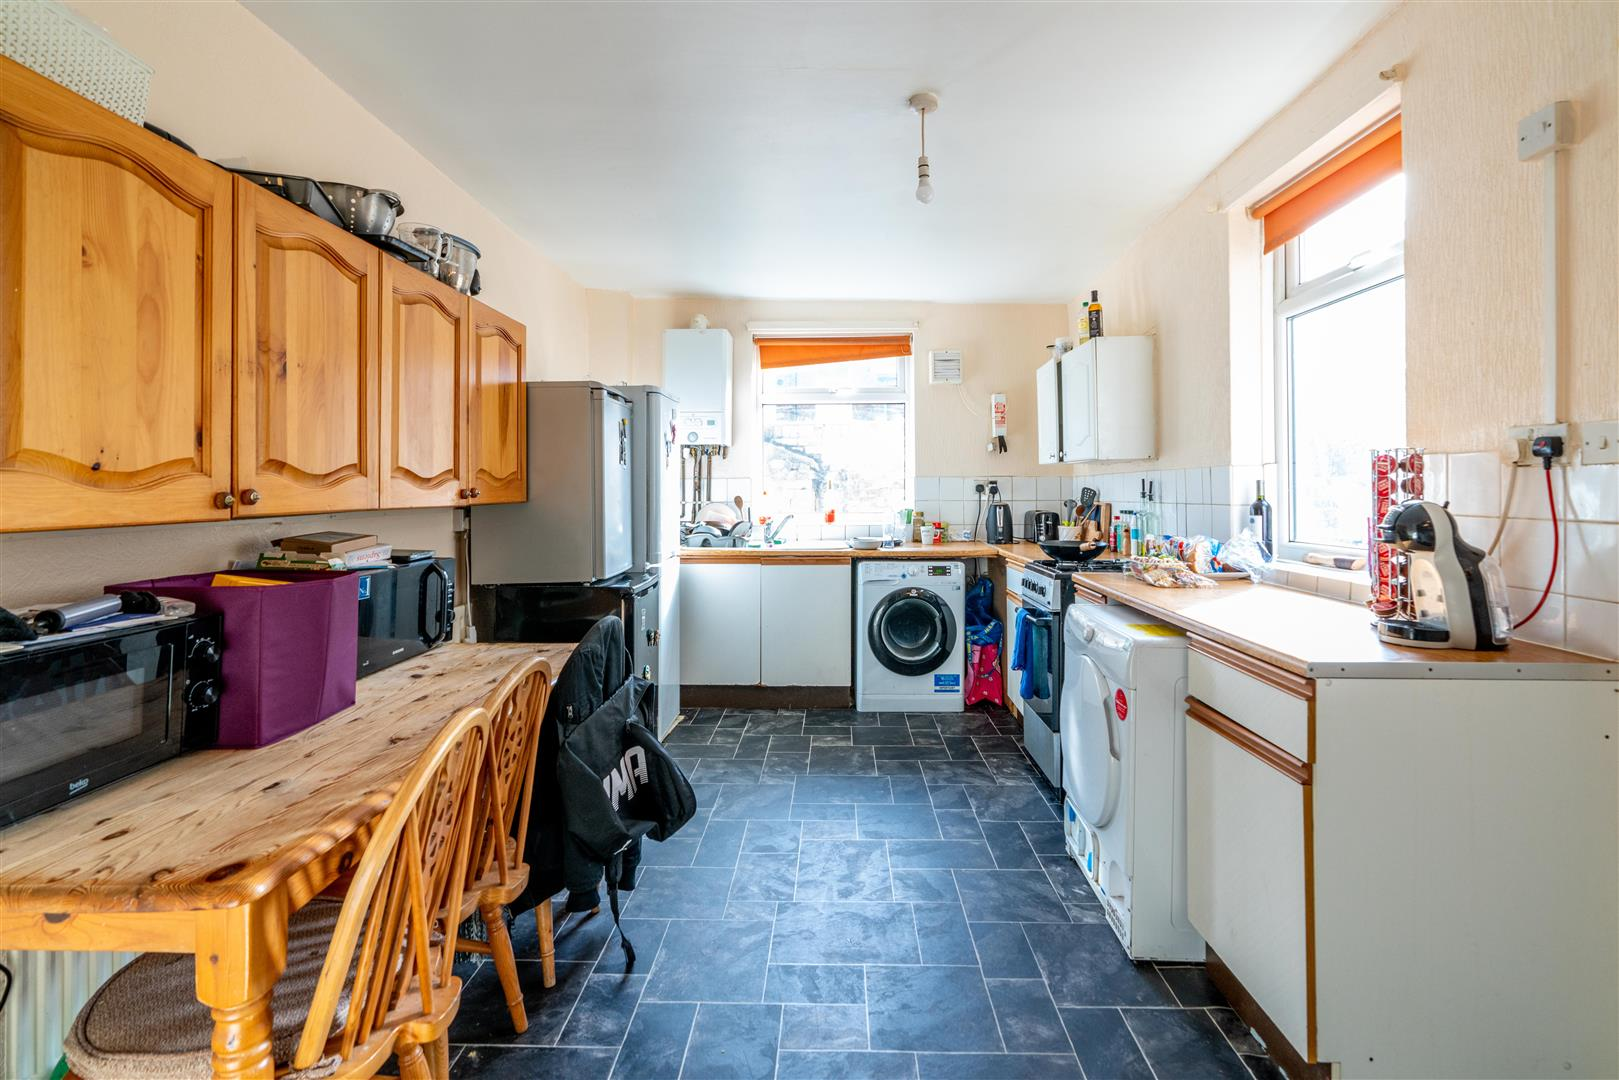 5 bed terraced house to rent in Heaton, NE6 5NU, NE6